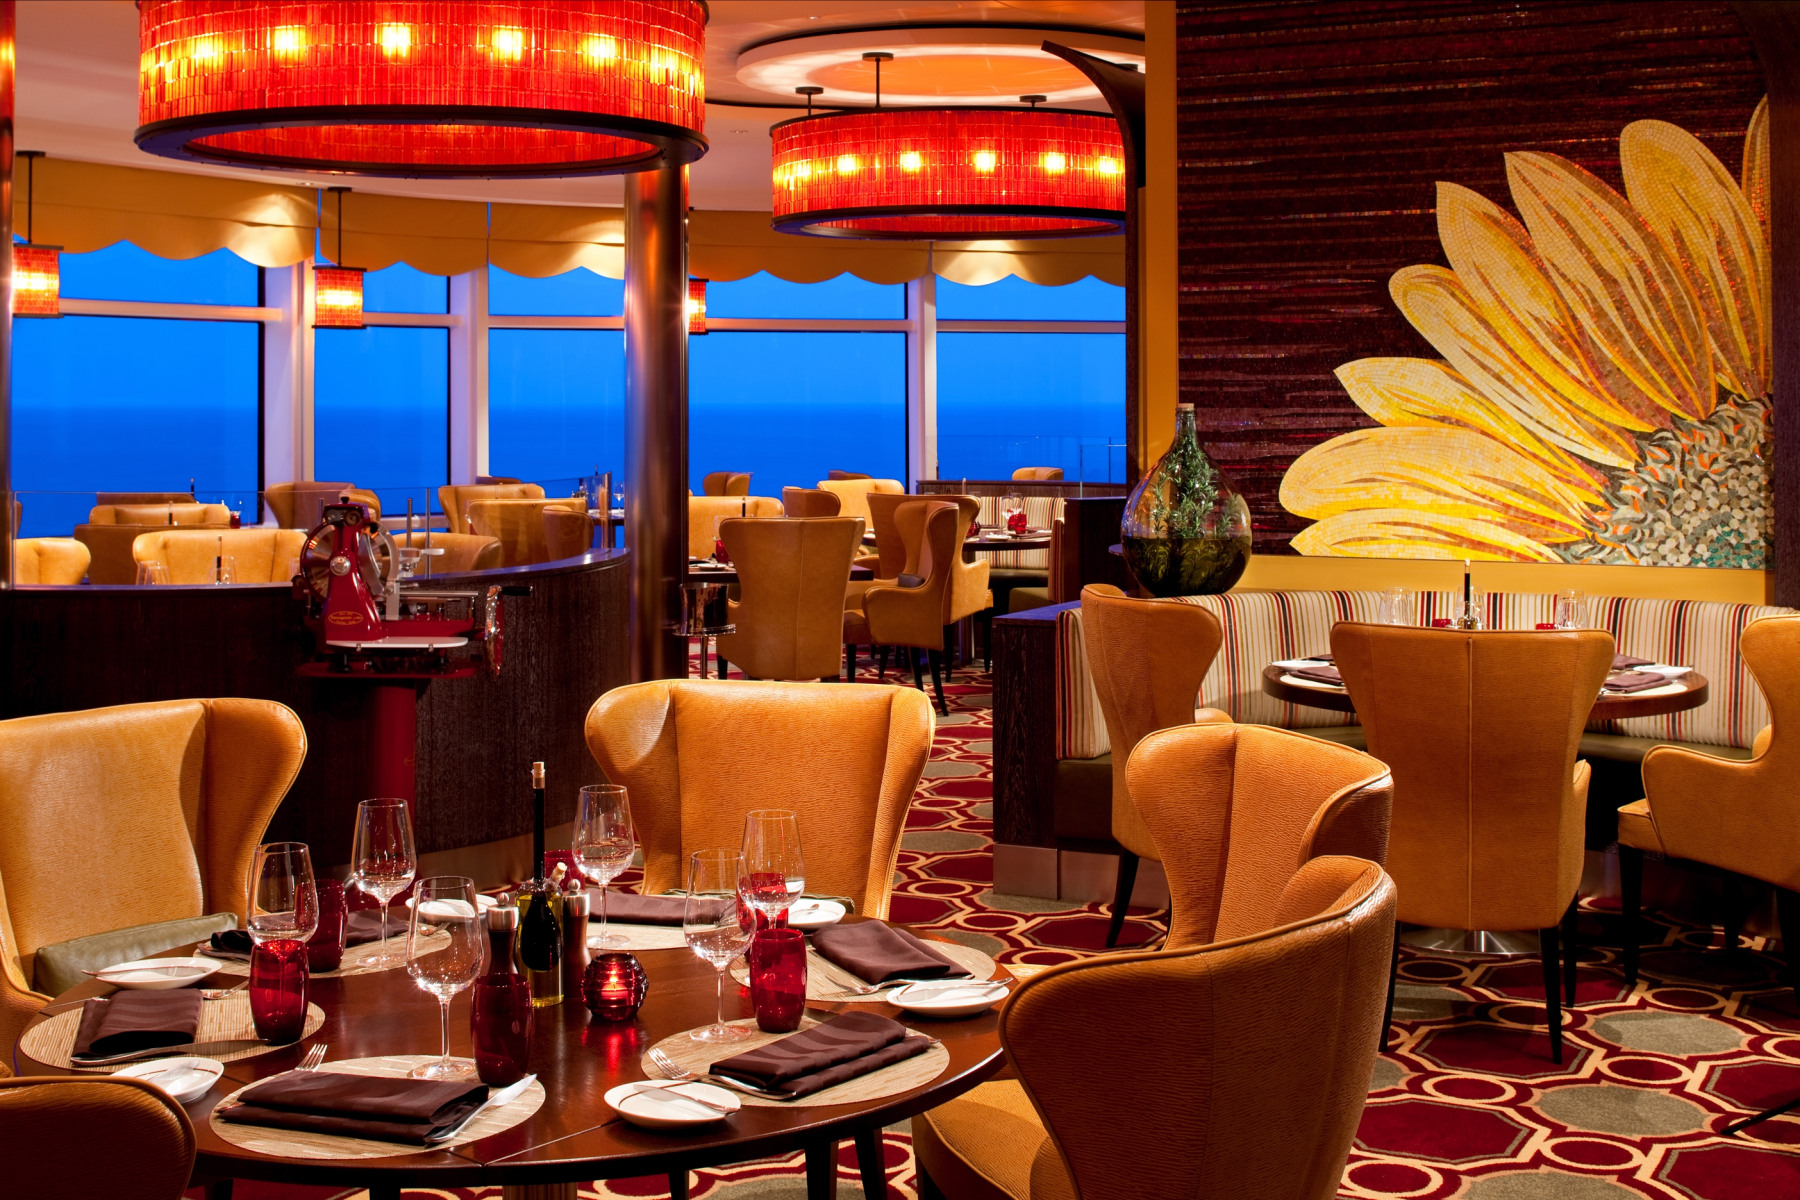 celebrity cruises celebrity eclipse tuscan grille restaurant.jpg